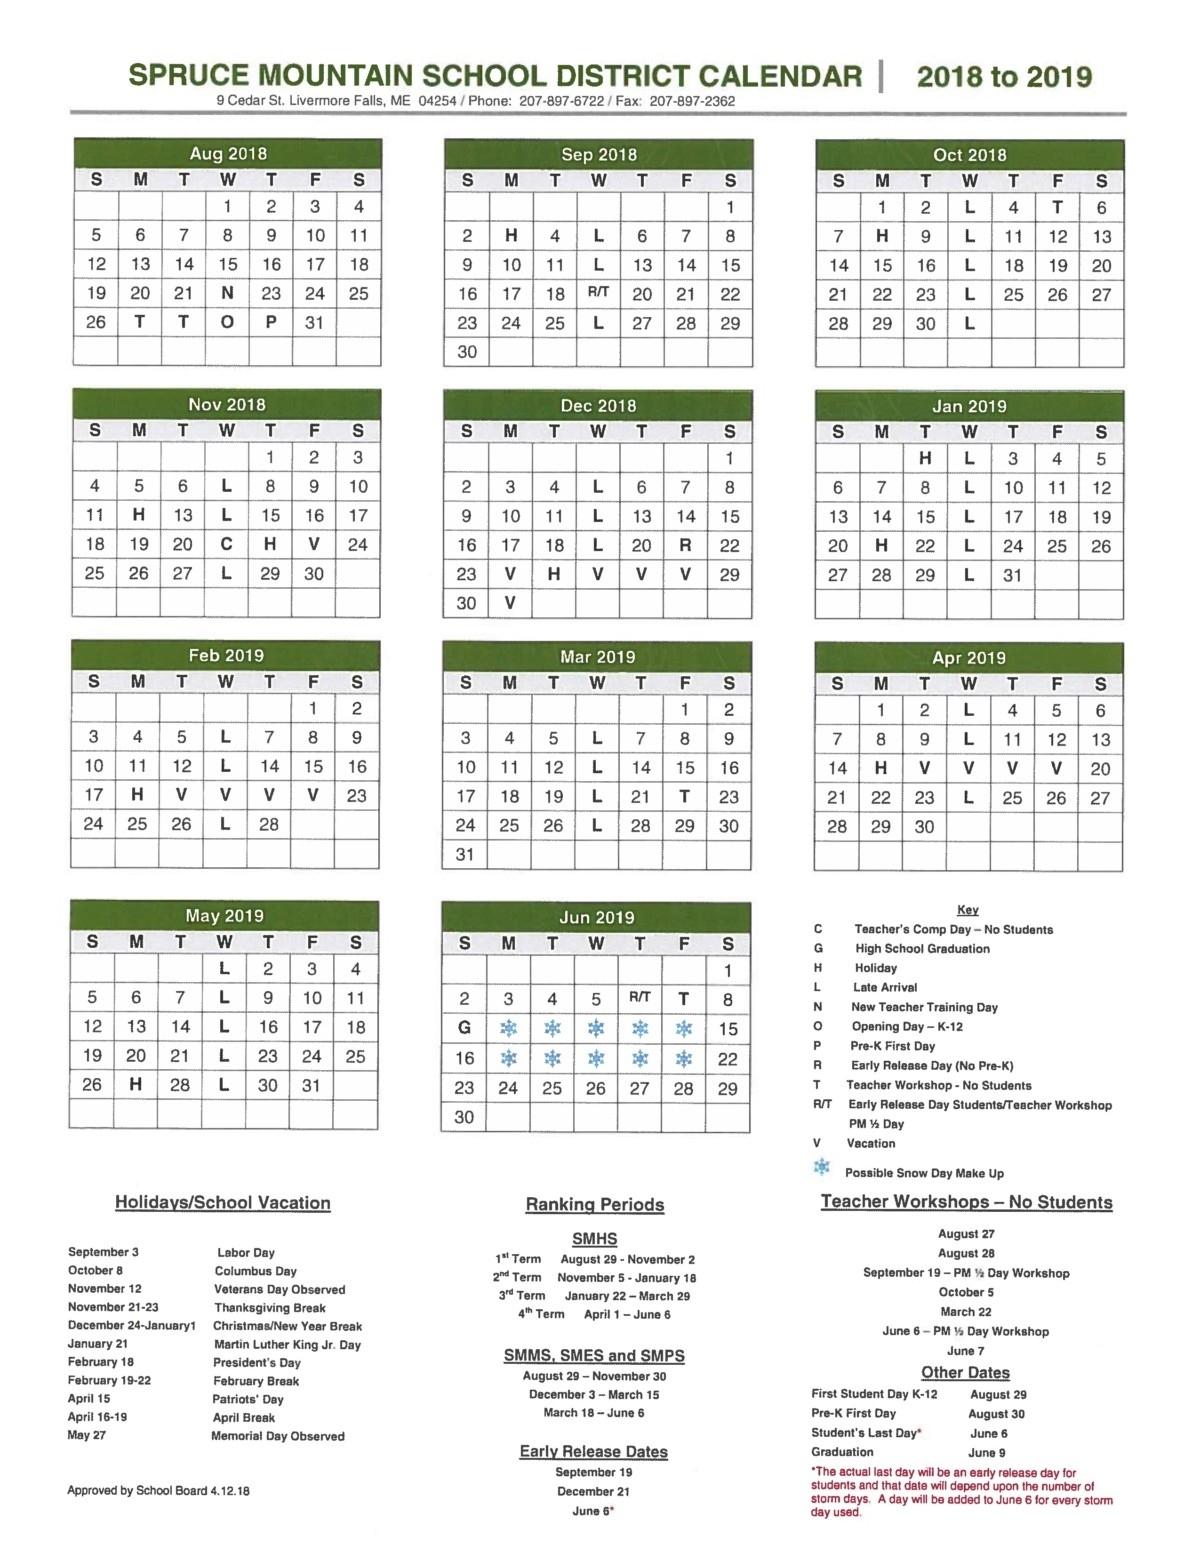 School Year Calendar - Spruce Mountain School District Calendar For School Year